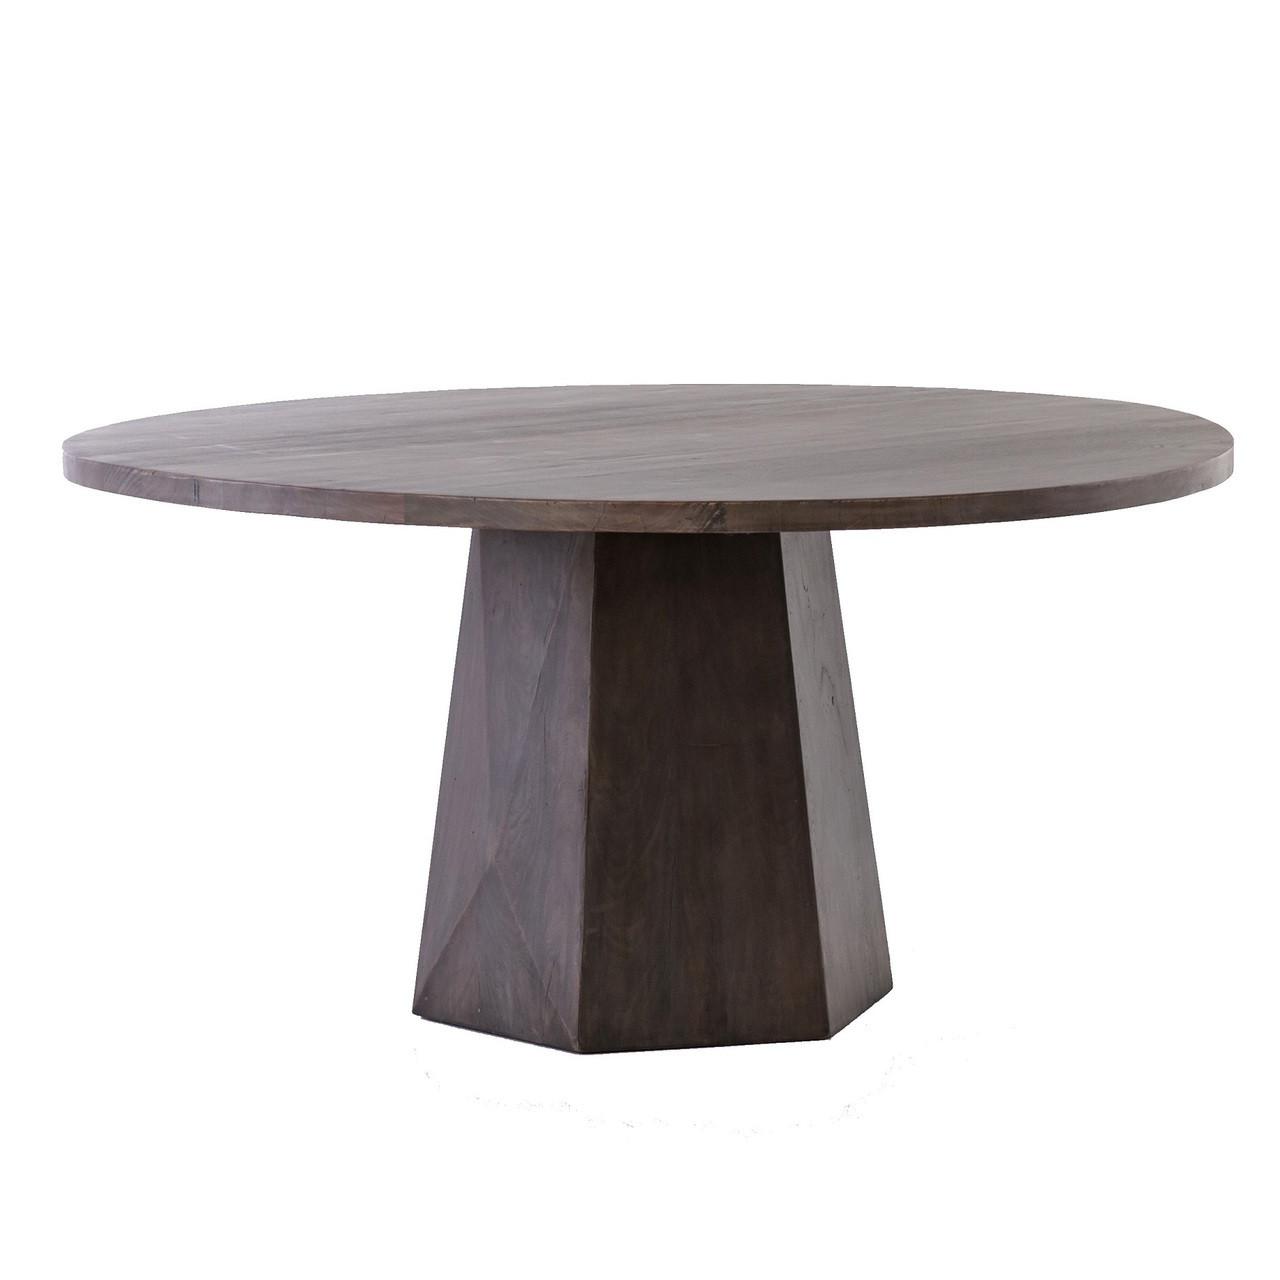 Kemper Reclaimed Wood Coal Grey Round Pedestal Dining Table - Whitewashed pedestal dining table